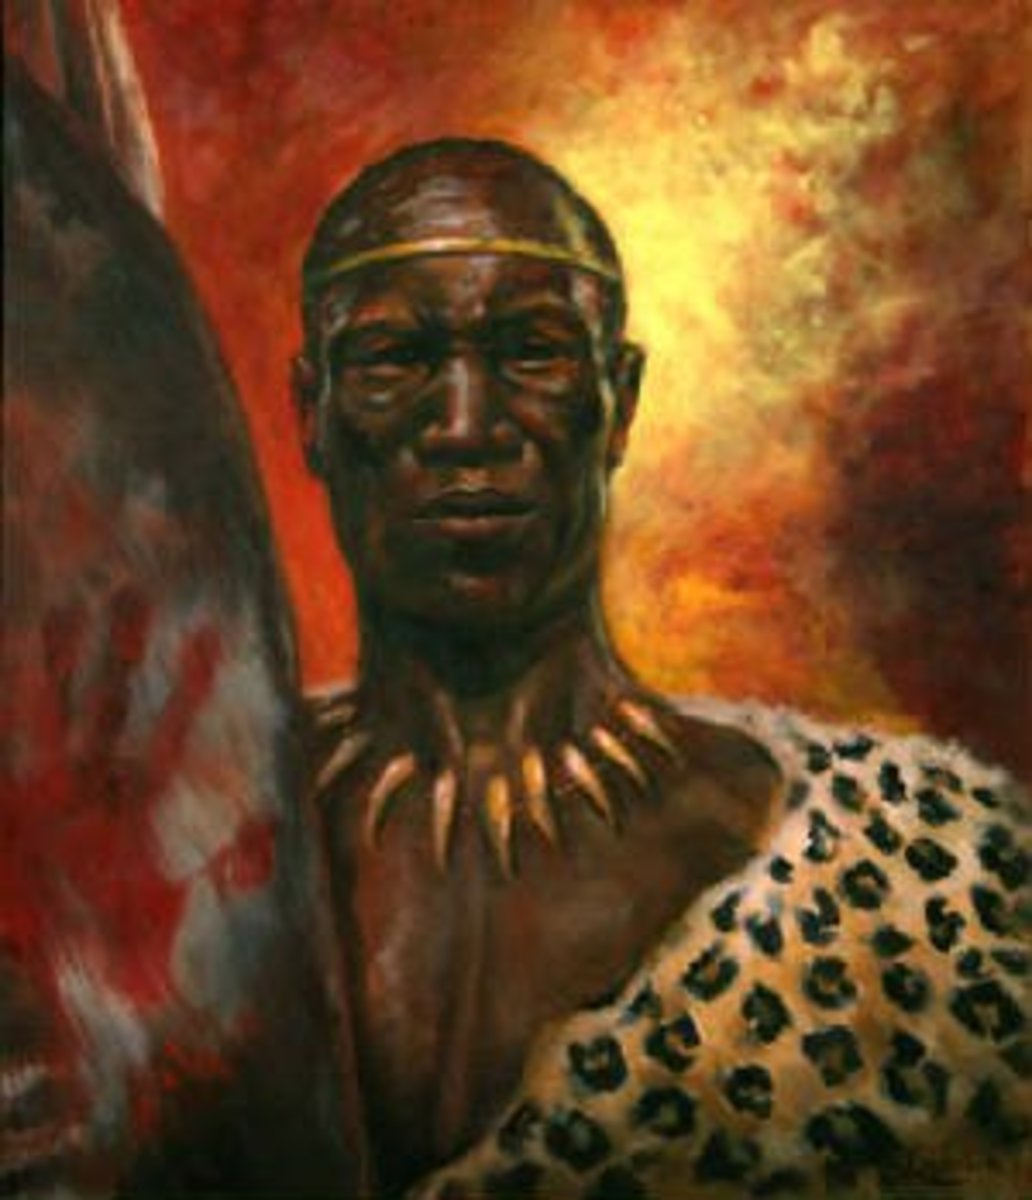 Artistic impression and portrait of Shaka